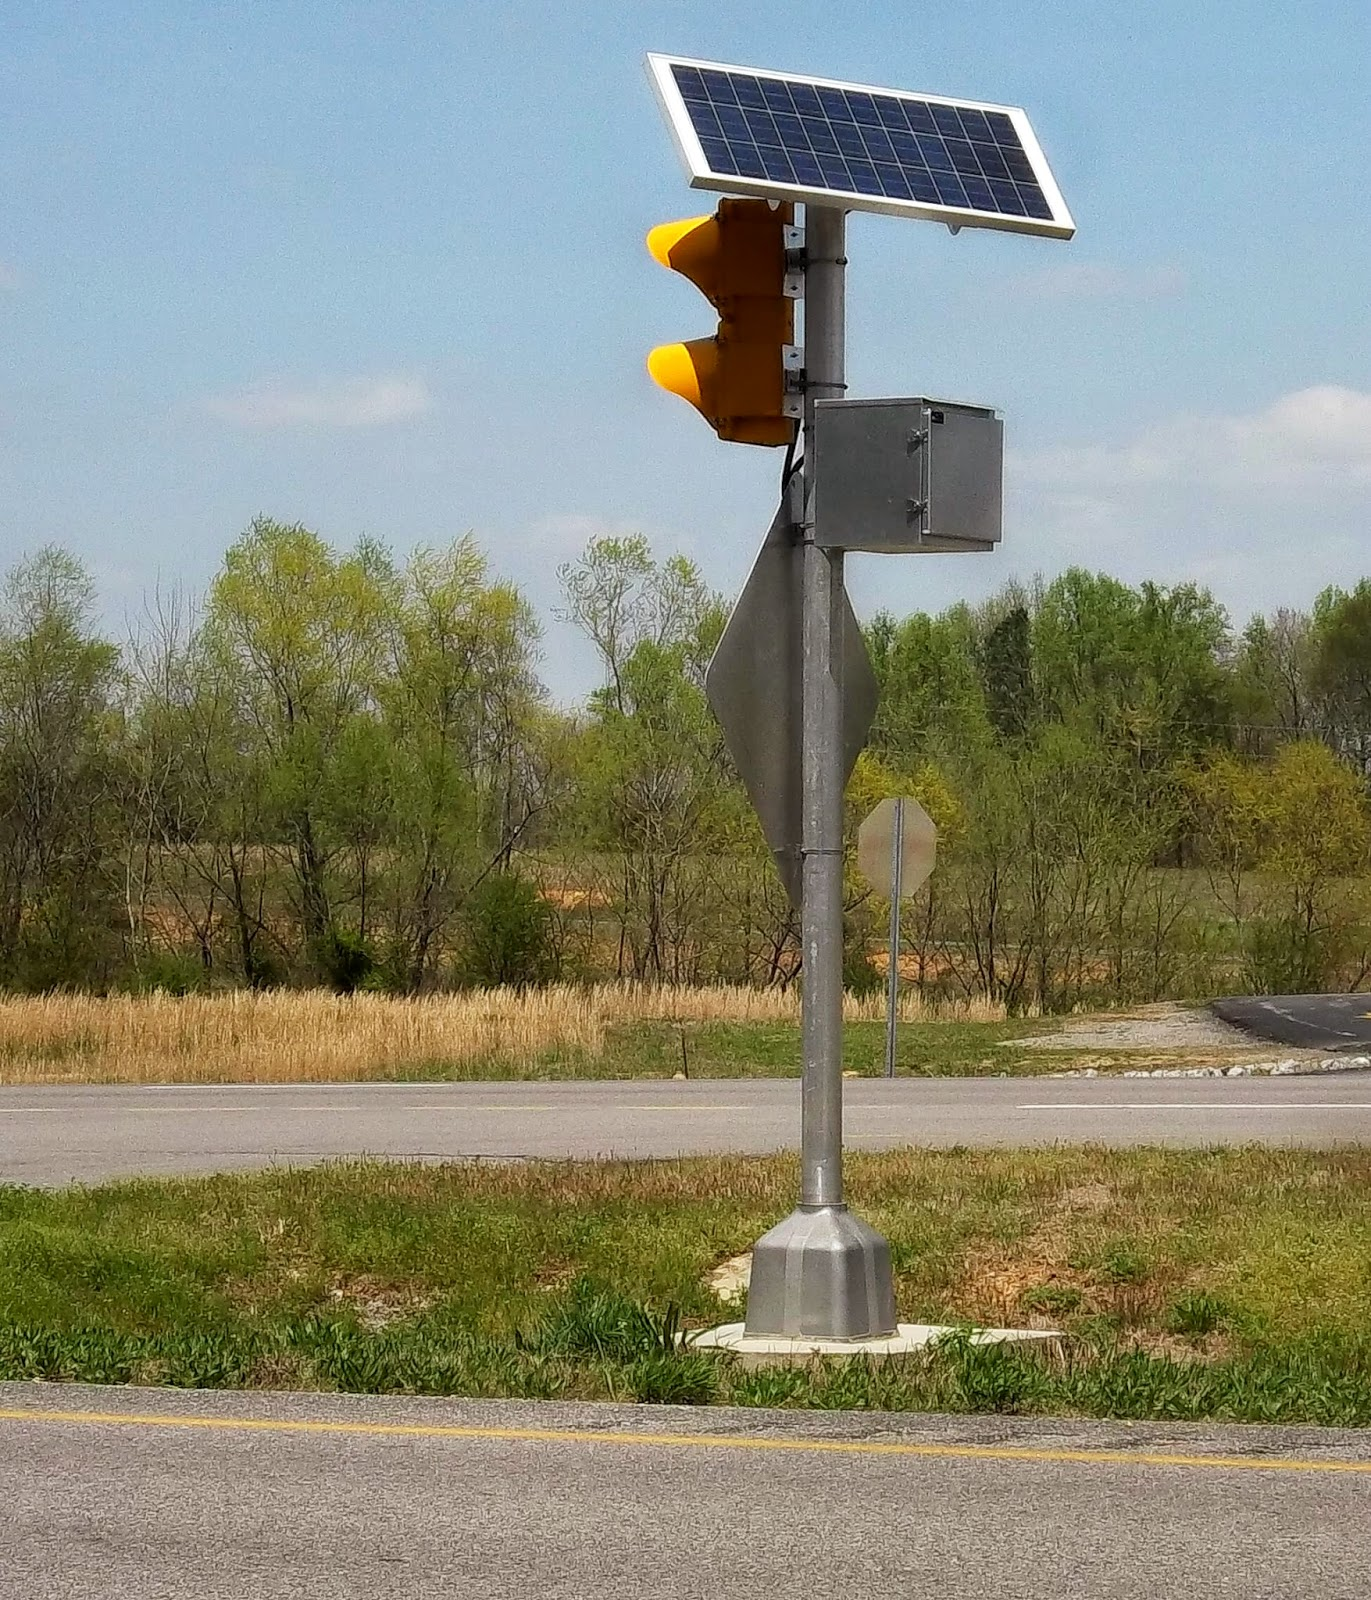 Practical parsimony solar powered traffic signal